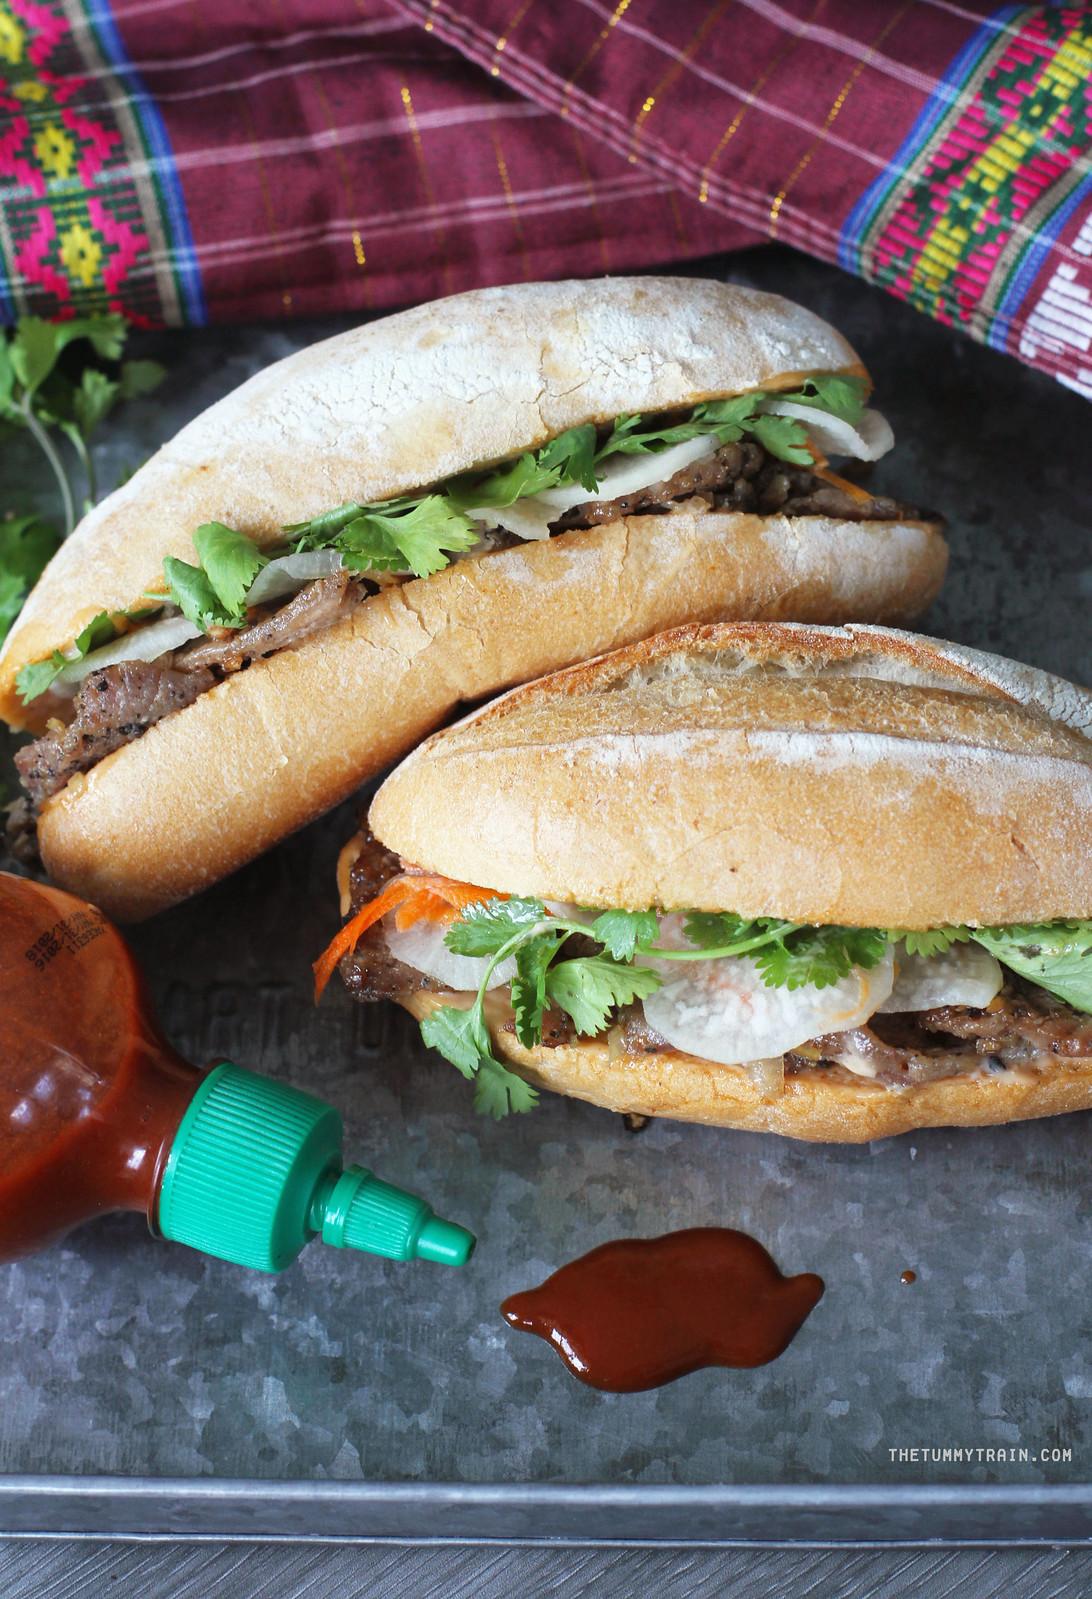 34479562120 2b61a1d14c h - Making Easy Lemongrass Pork Banh Mi At Home